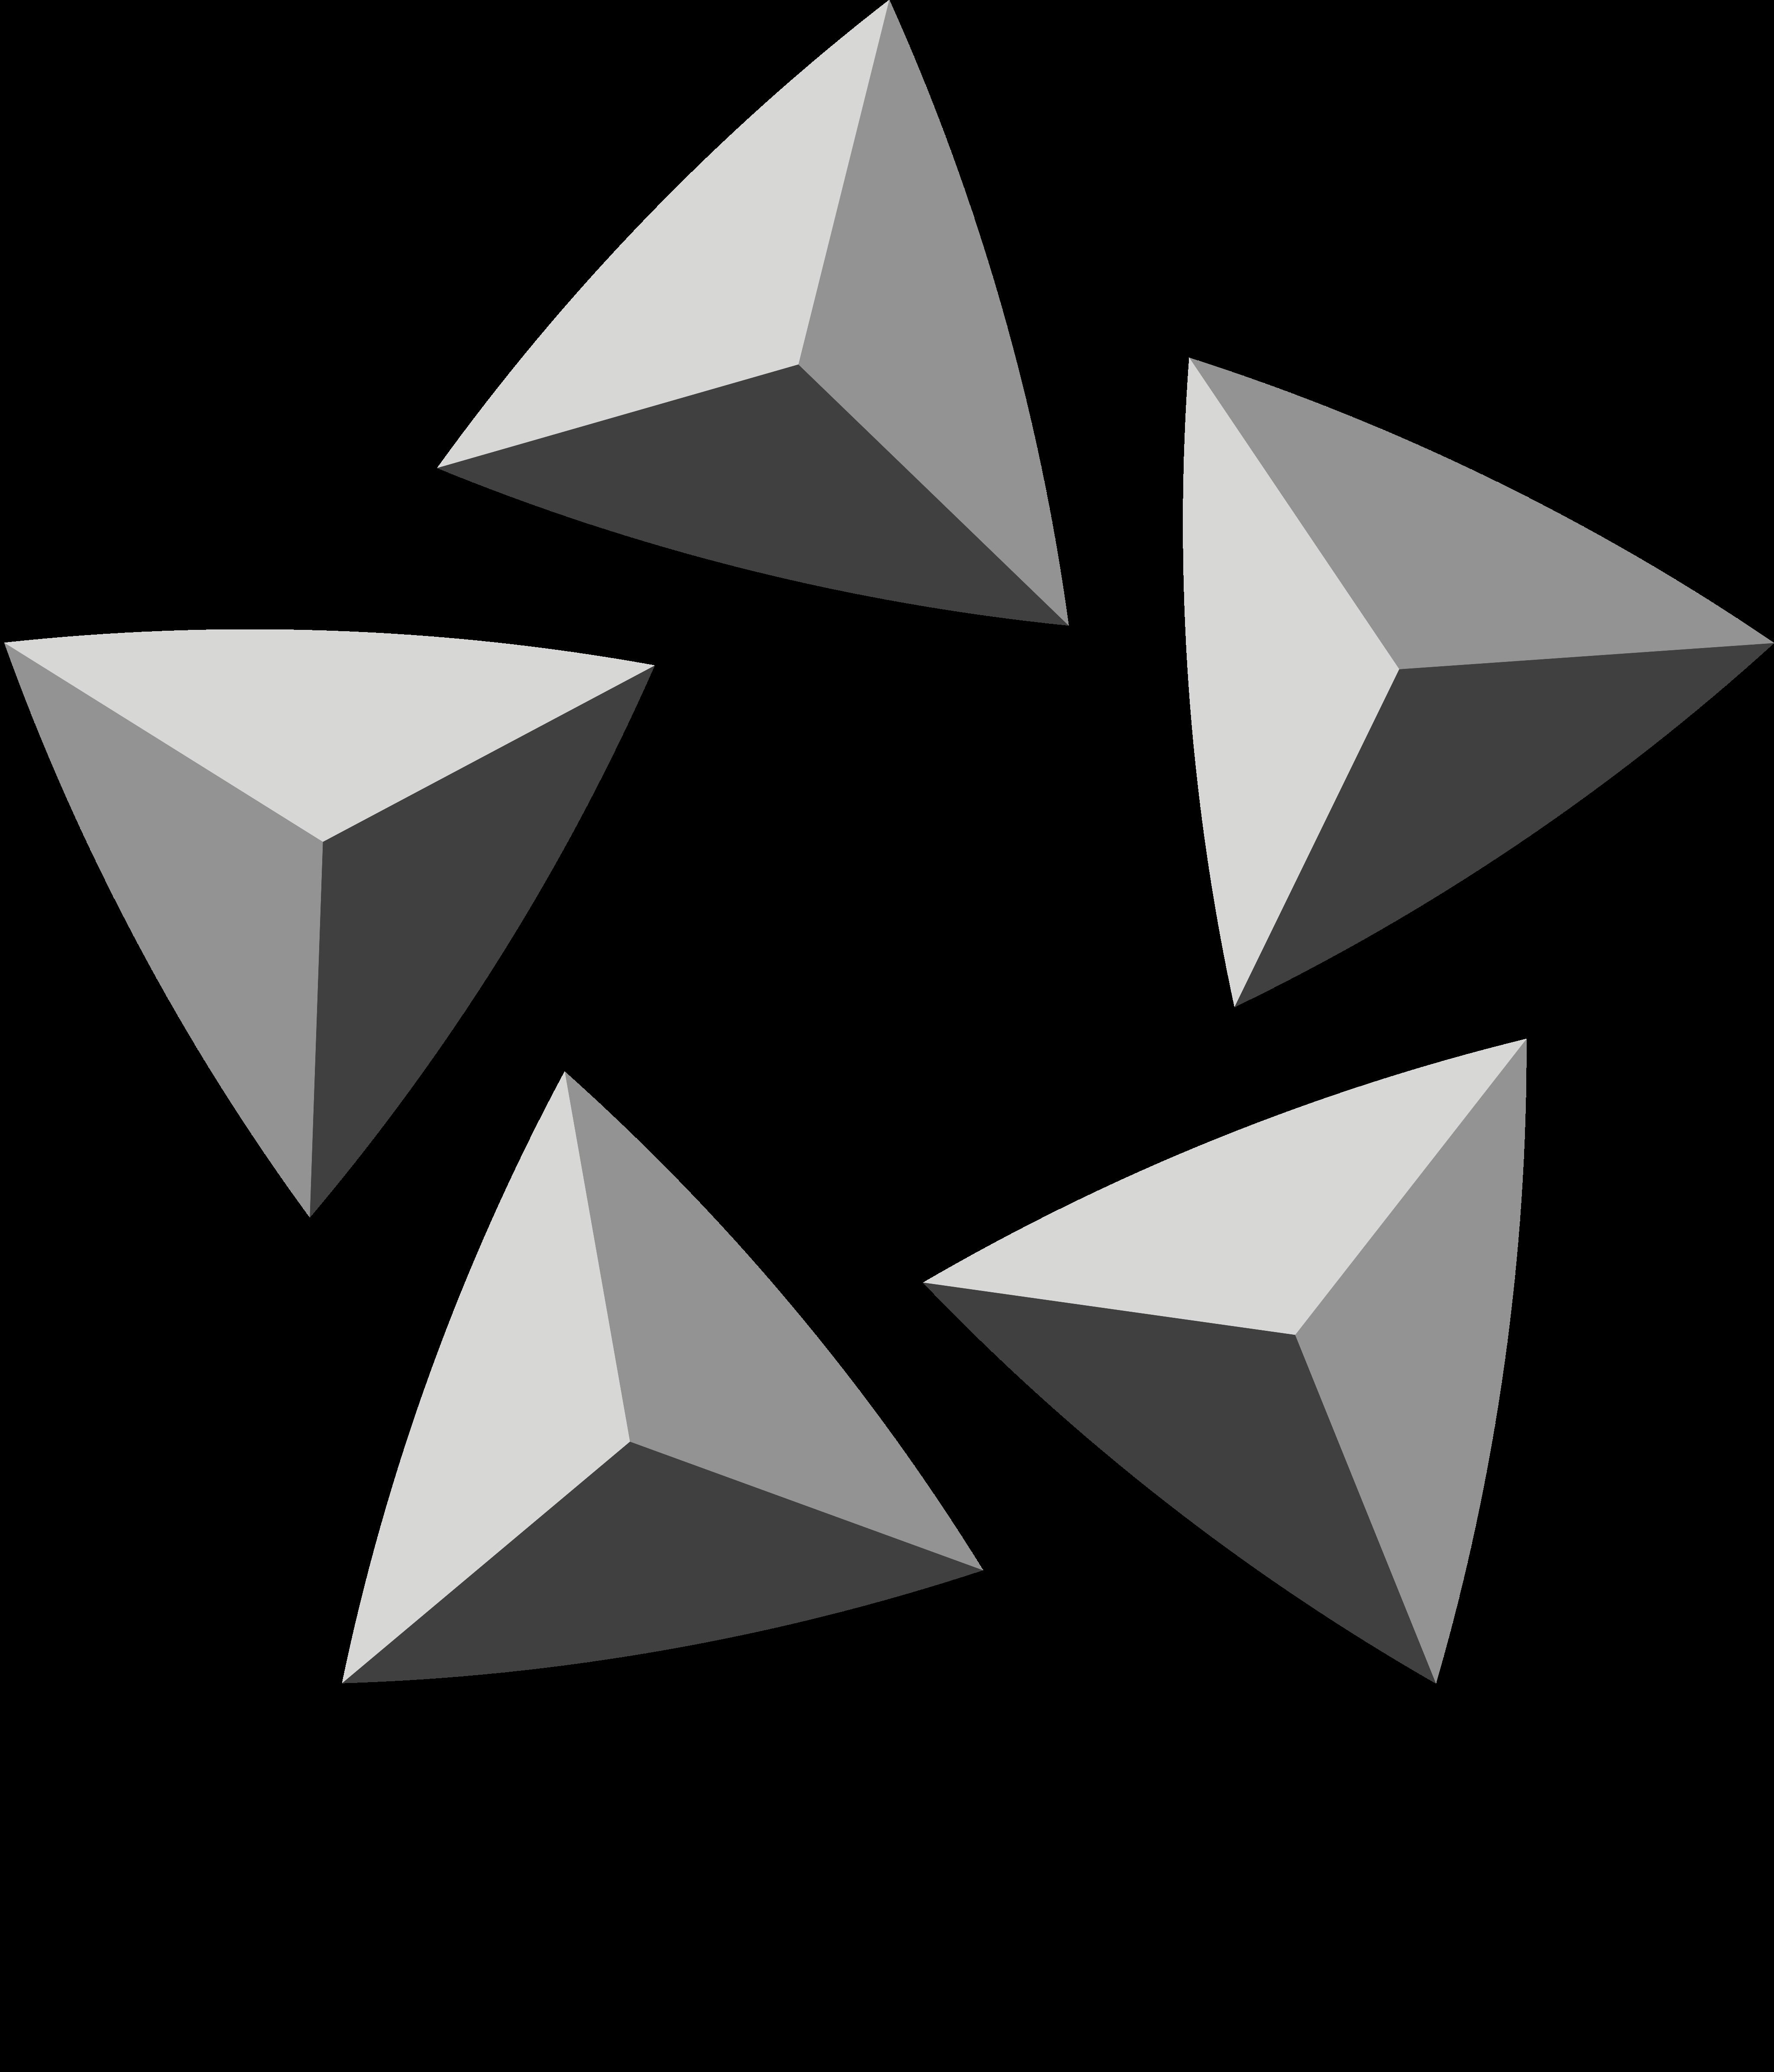 star alliance logo 2 - Star Alliance Logo